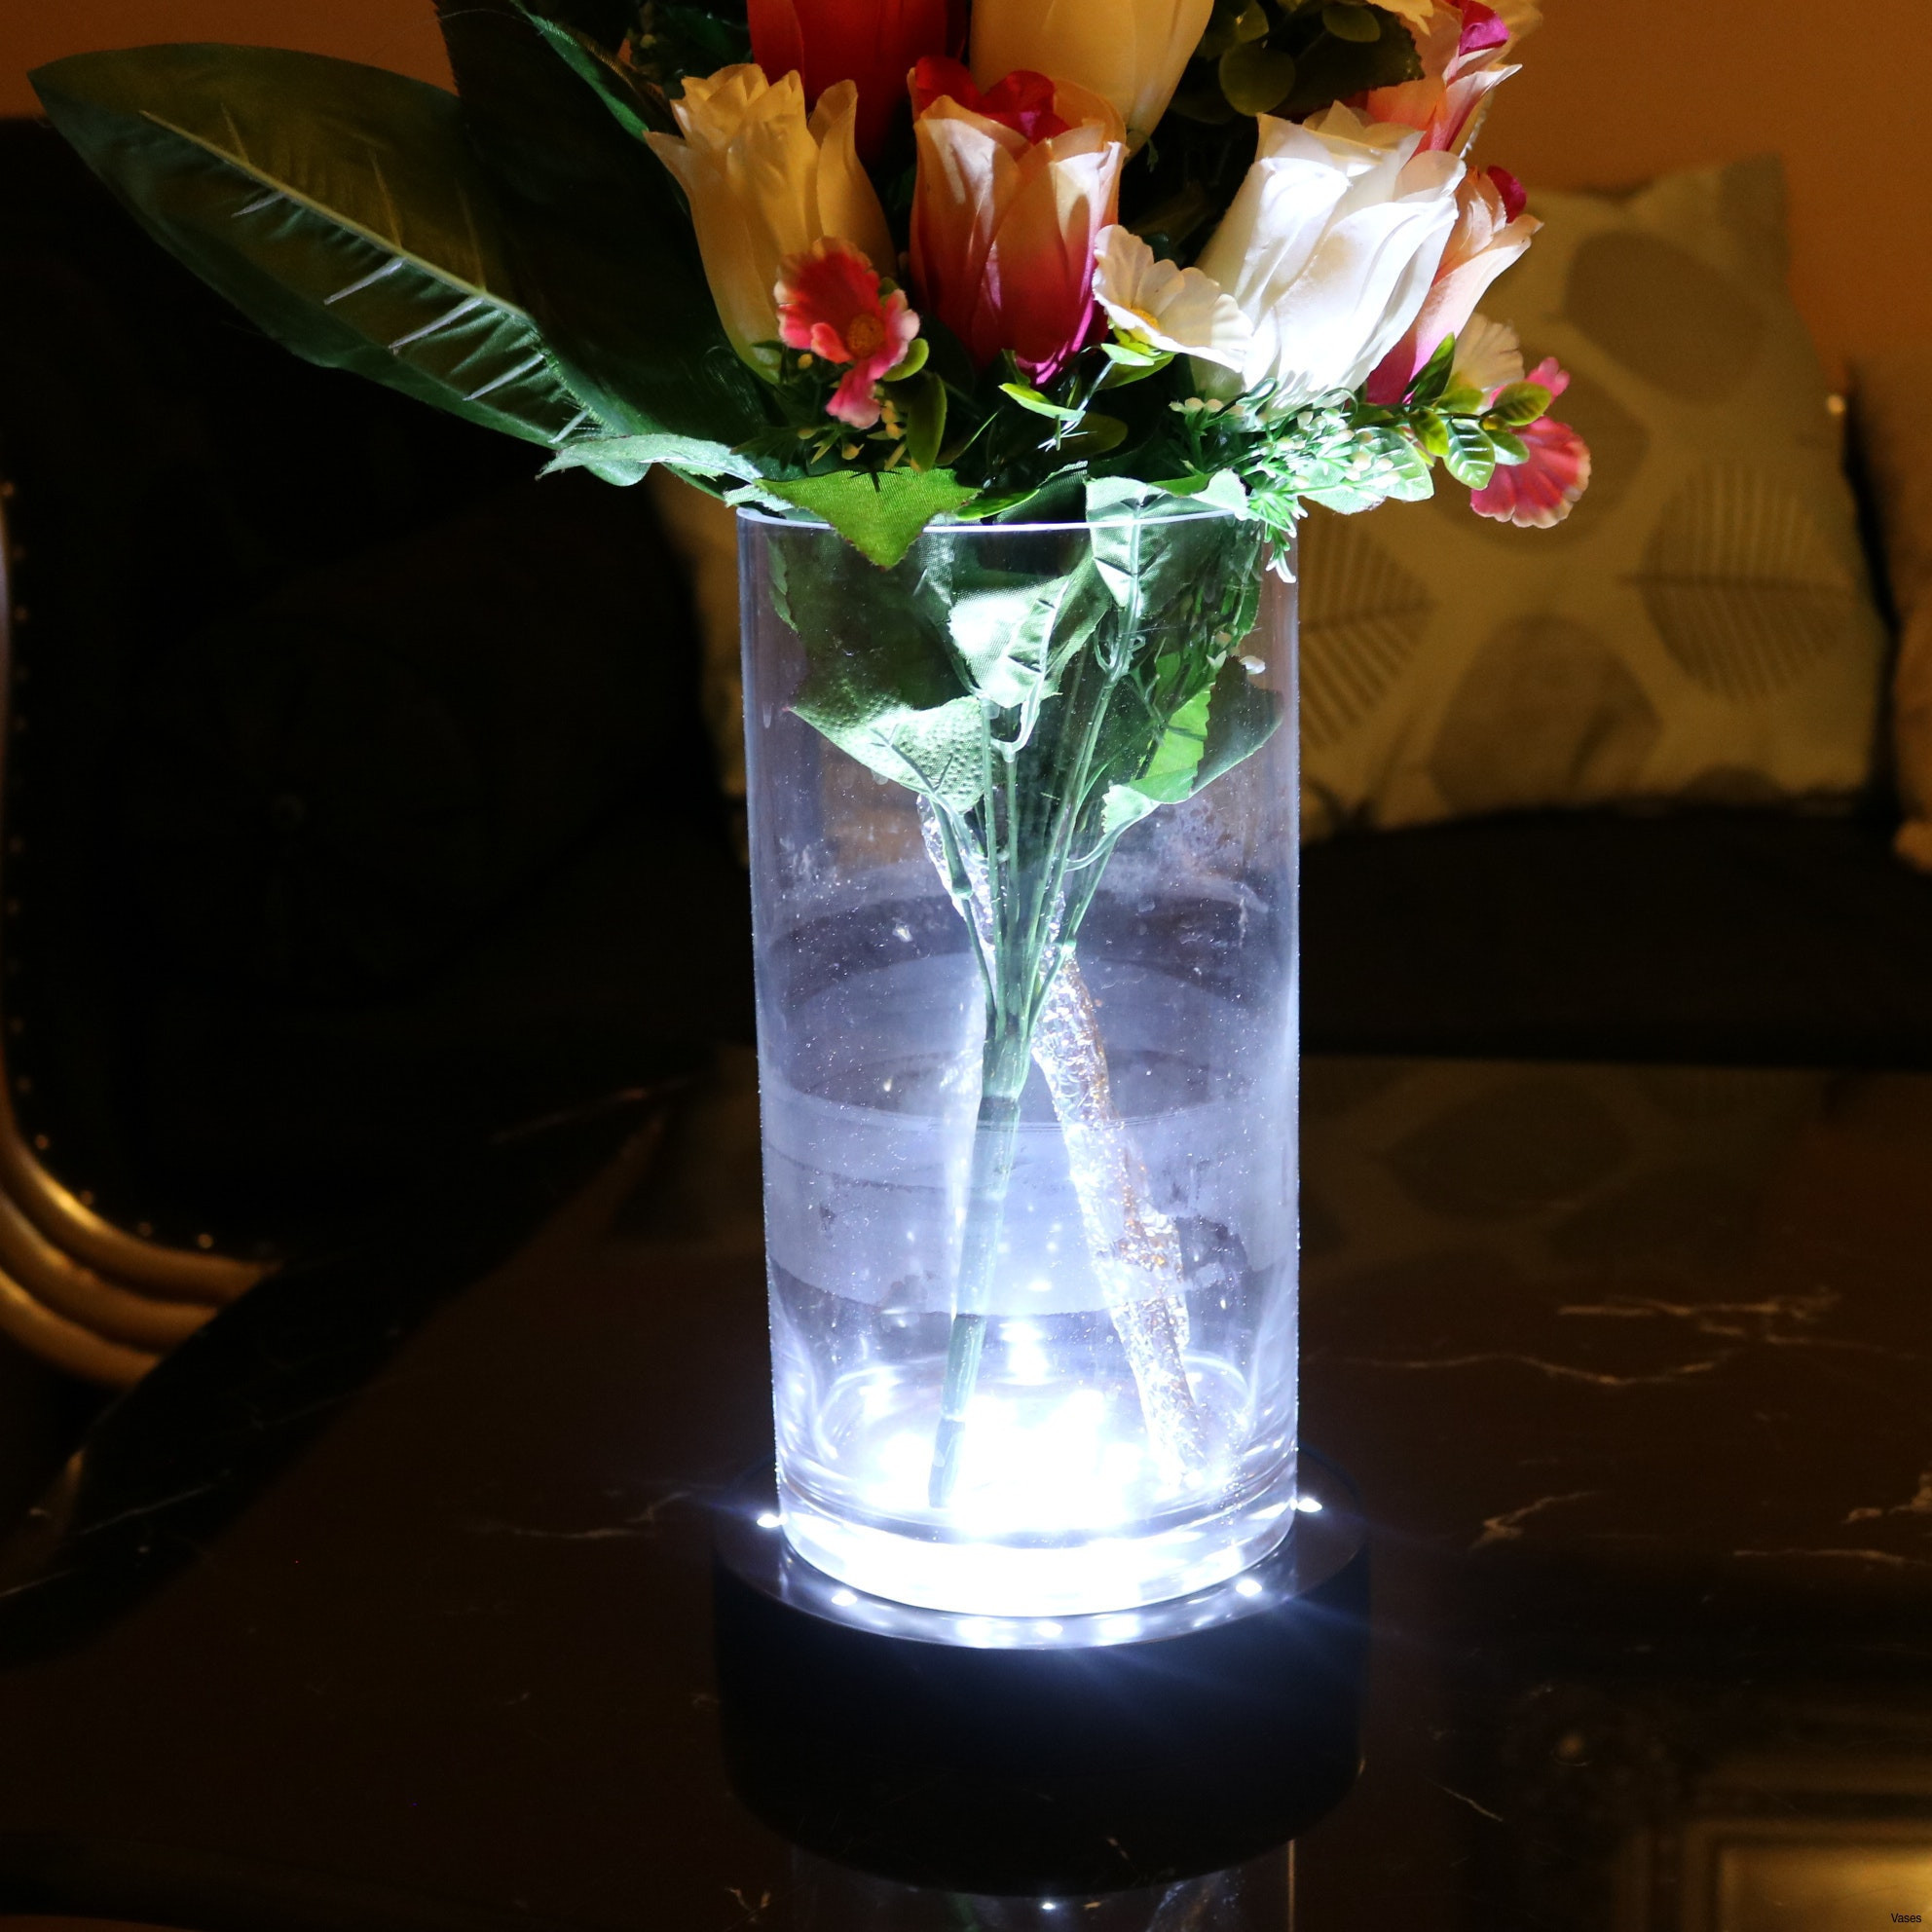 ikebana vases for sale uk of flower arrangement petition in schools floral arrangement inspiration for vases disposable plastic single cheap flower rose vasei 0d design design ideas dog flor